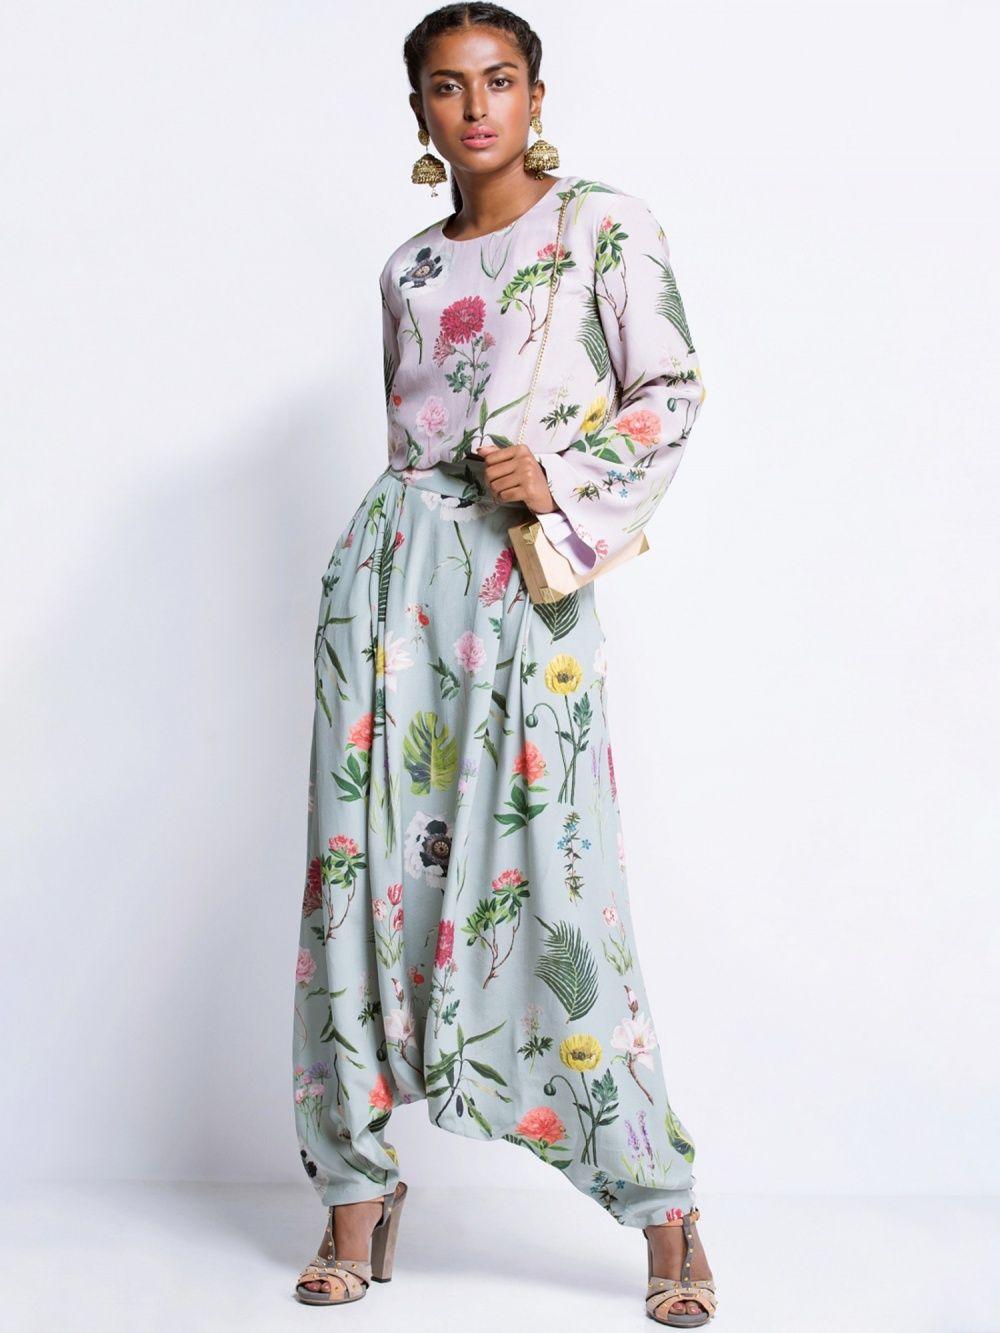 b12c6ecc2ef Payal Singhal Shirts Tops and Crop Tops   Buy Payal Singhal Lilac ...